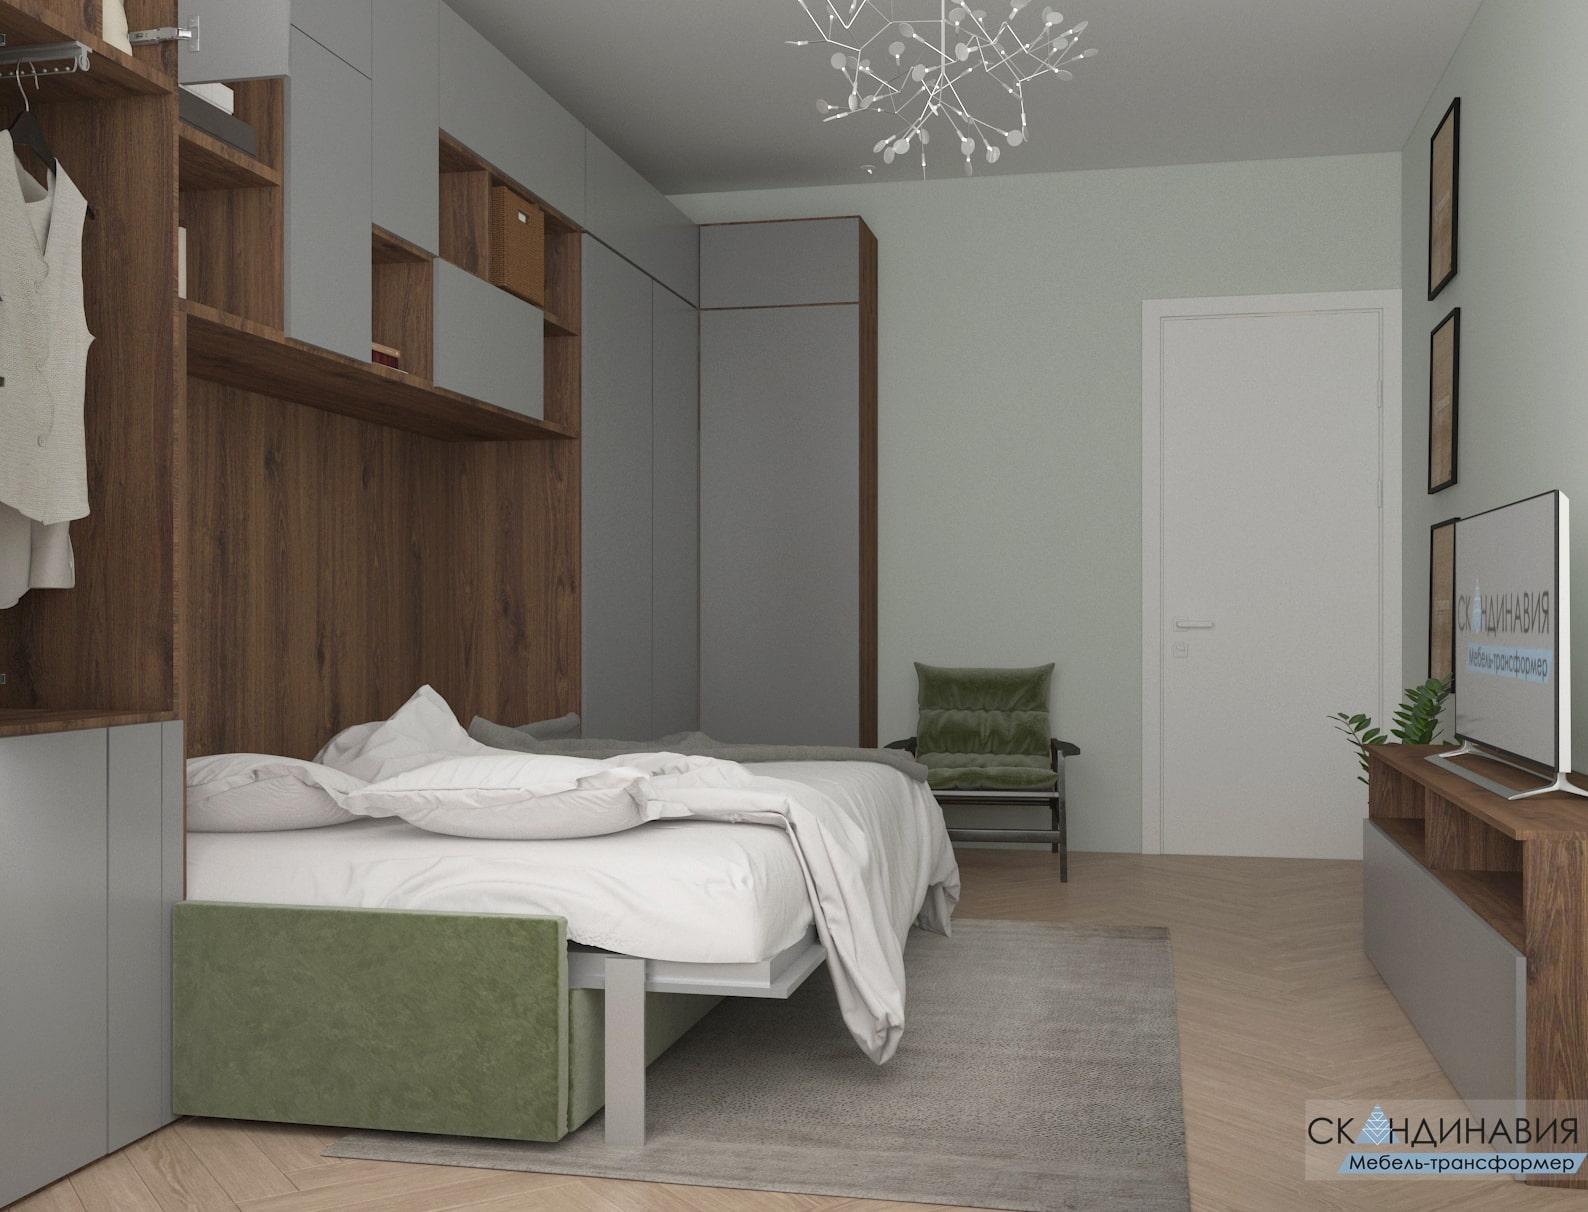 Преимущества кровати-трансформера